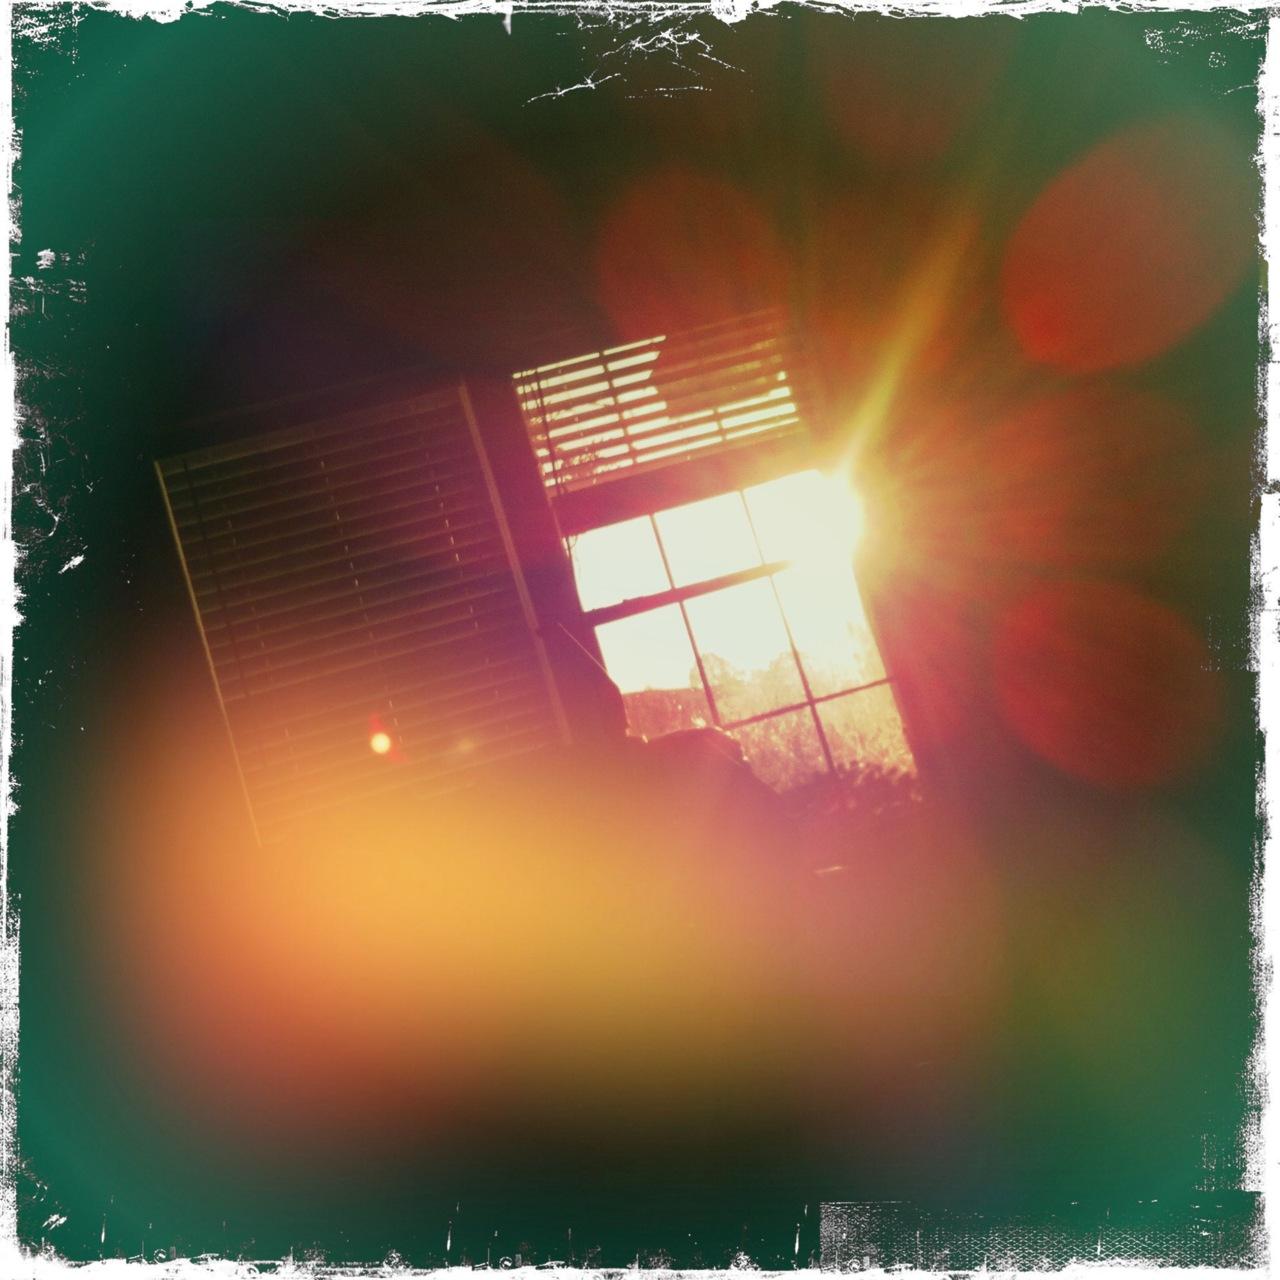 Morning sunrise window 3 Jimmy Lens, Kodot XGrizzled Film, Dreampop Flash,